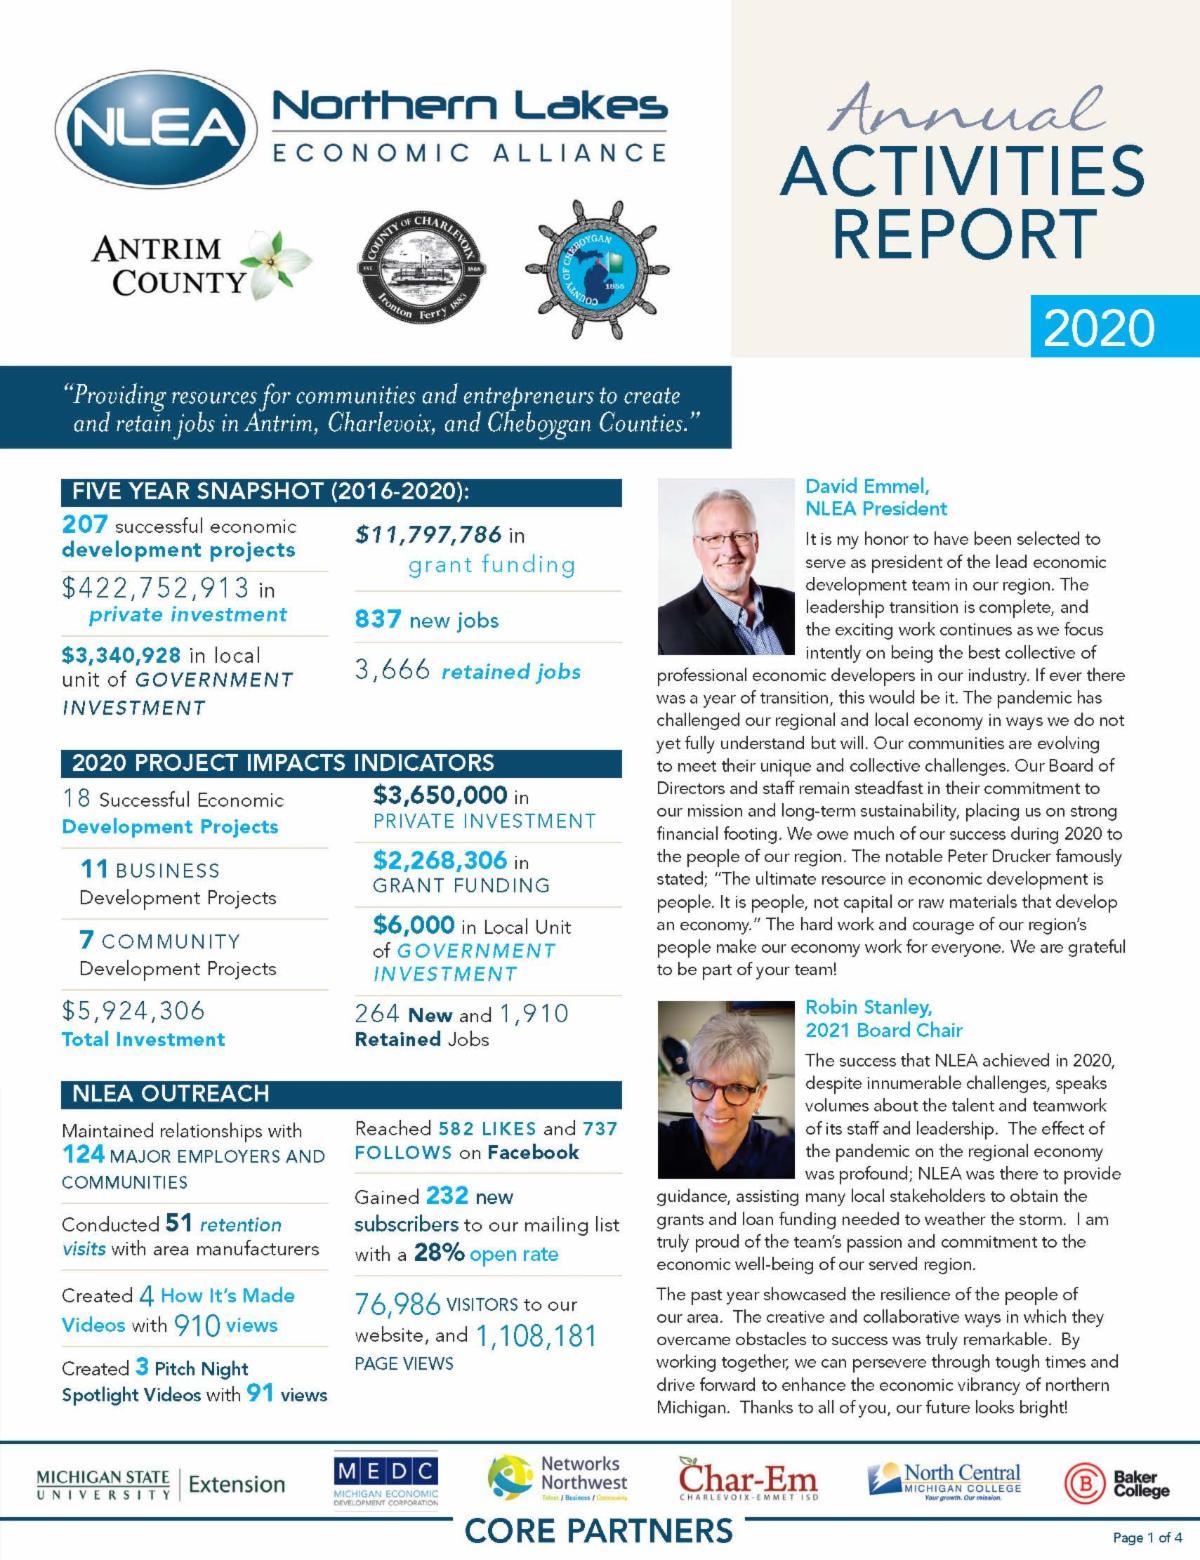 NLEA 2020 report thumbnail